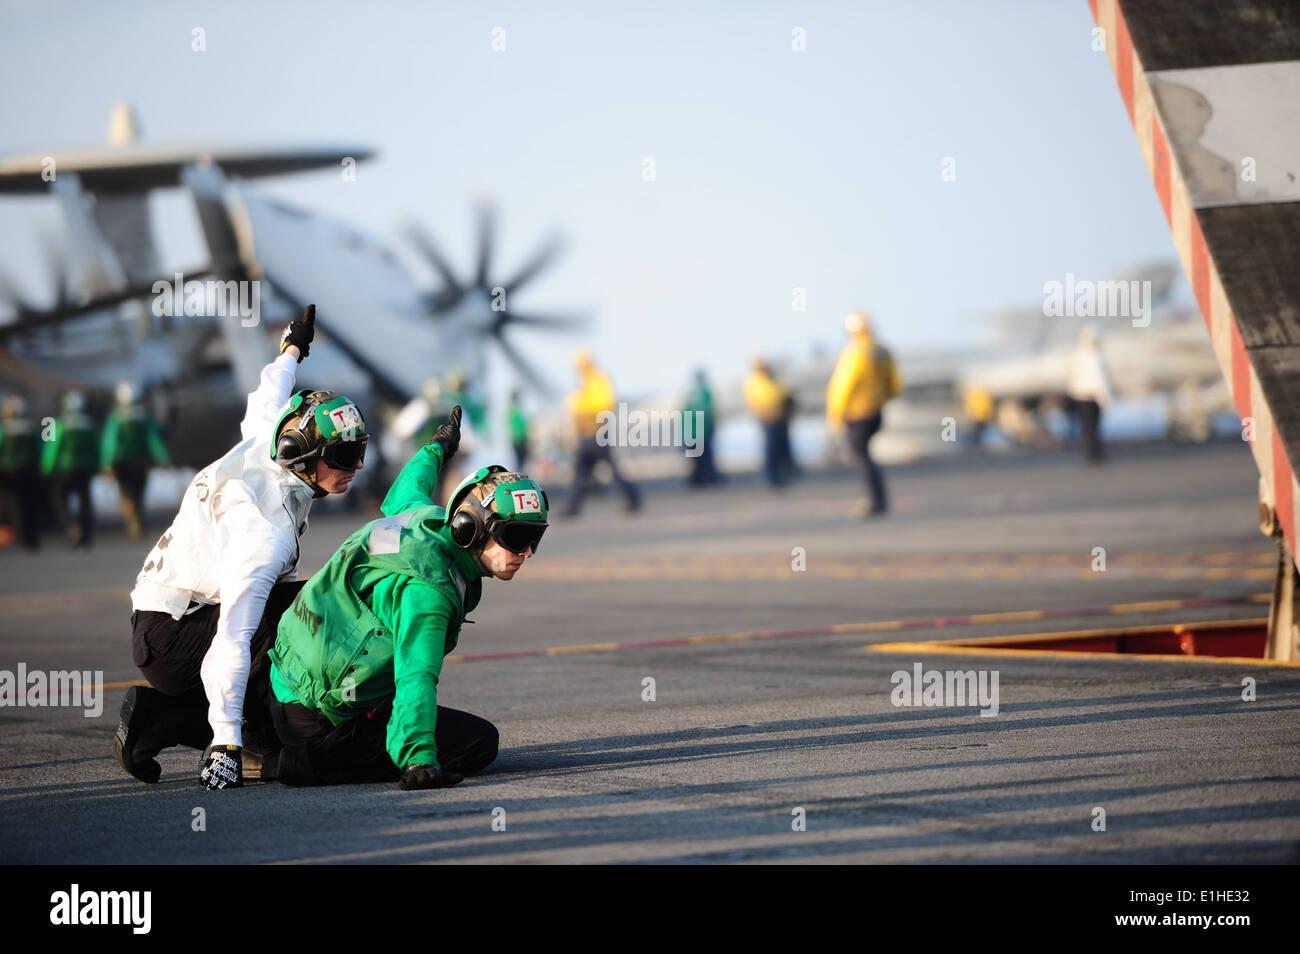 u s navy aviation machinist s mate rd class william catlin u s navy aviation machinist s mate 2nd class joshua ginieczki left and aviation machinist s mate